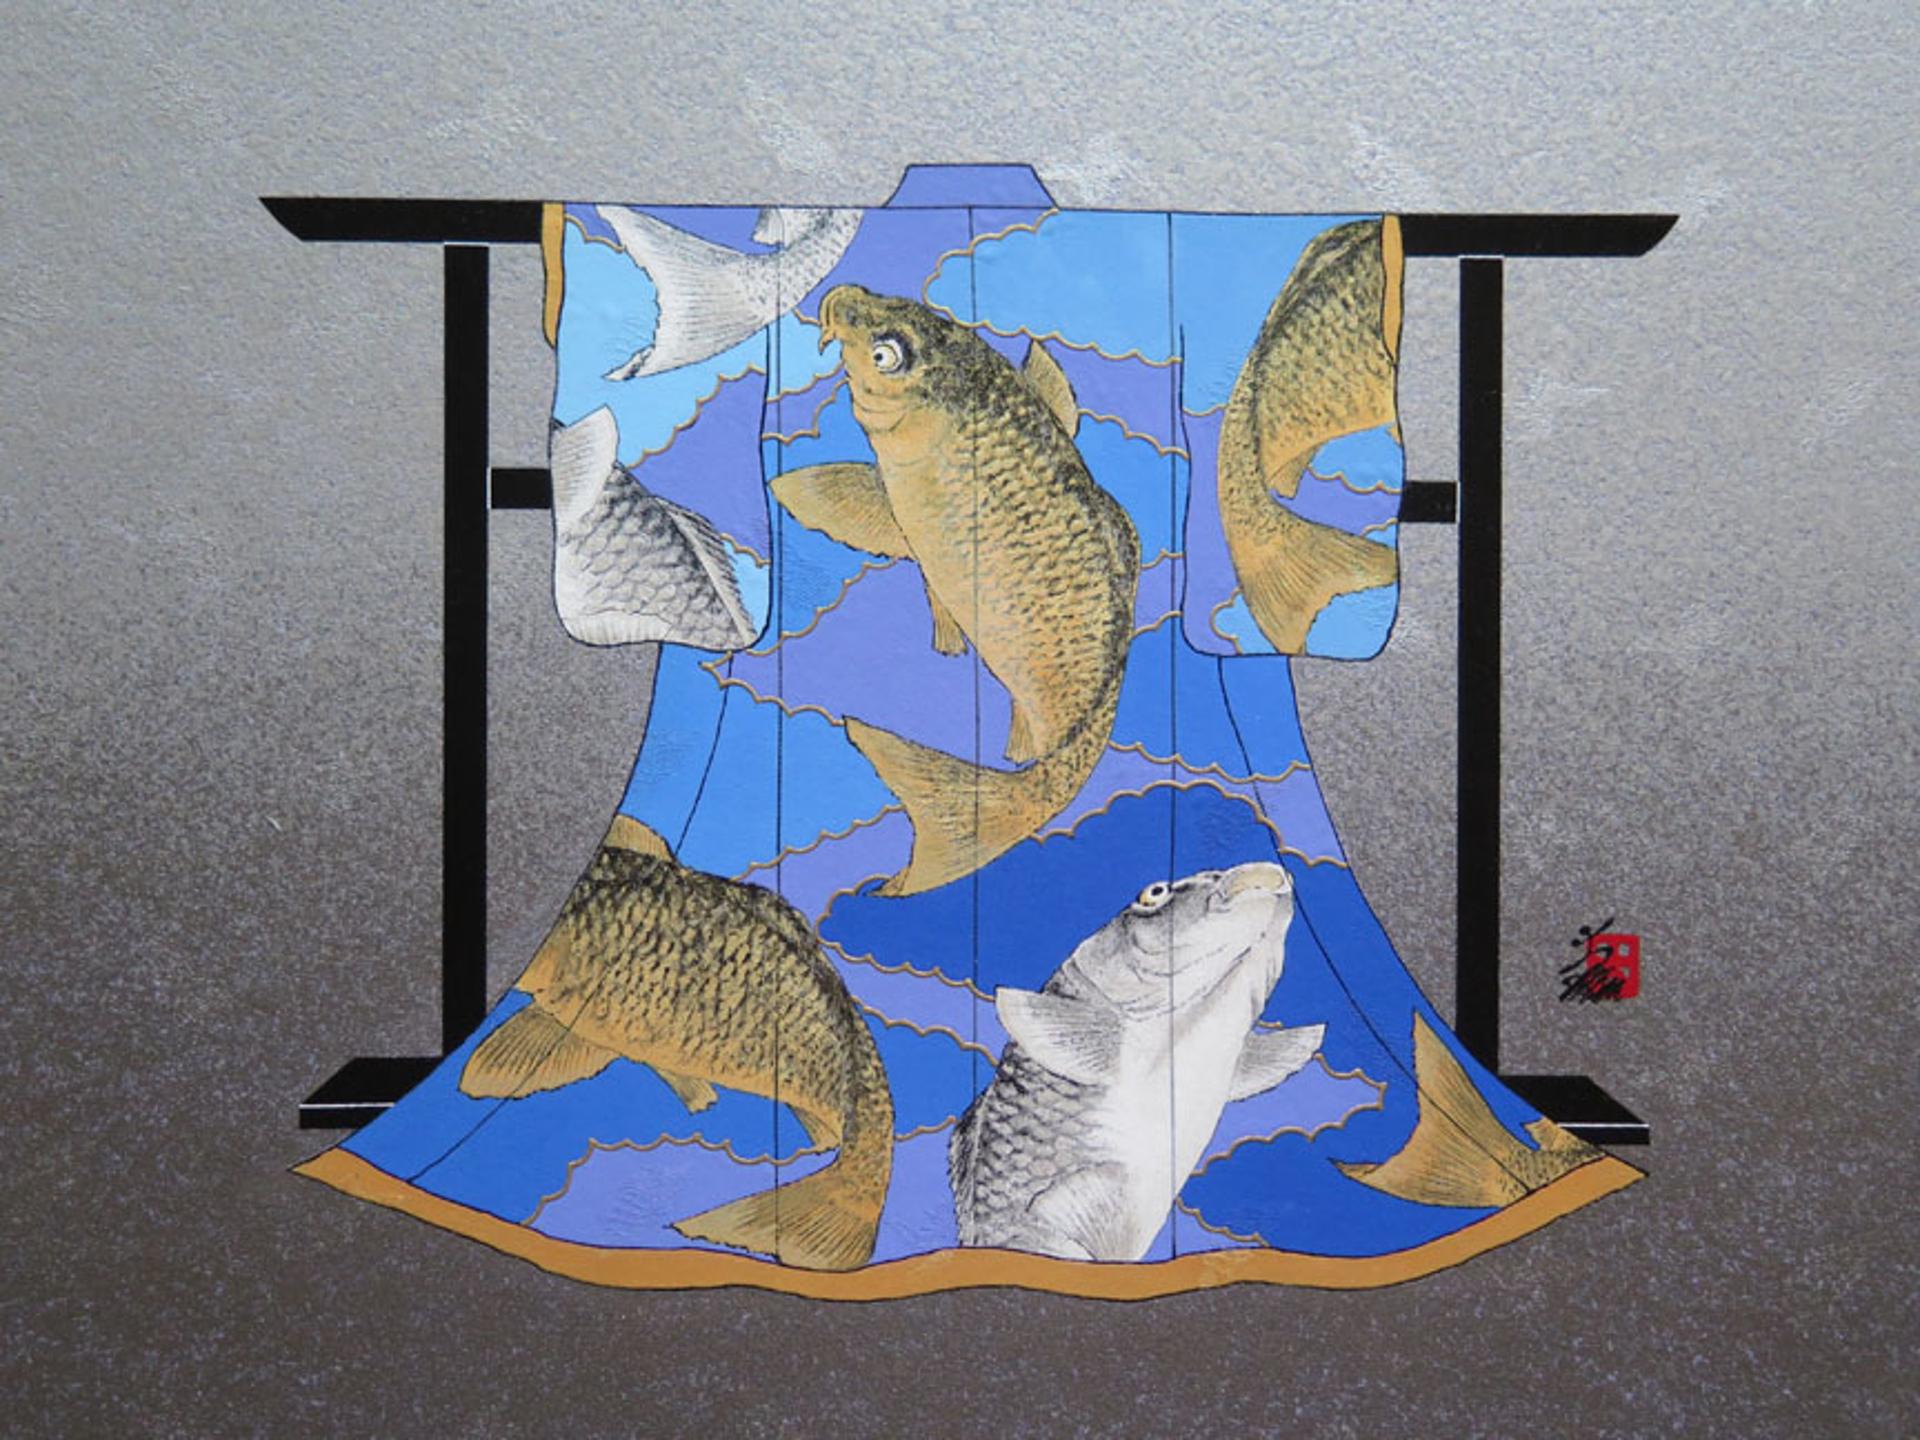 Gold Silver Koi by Hisashi Otsuka